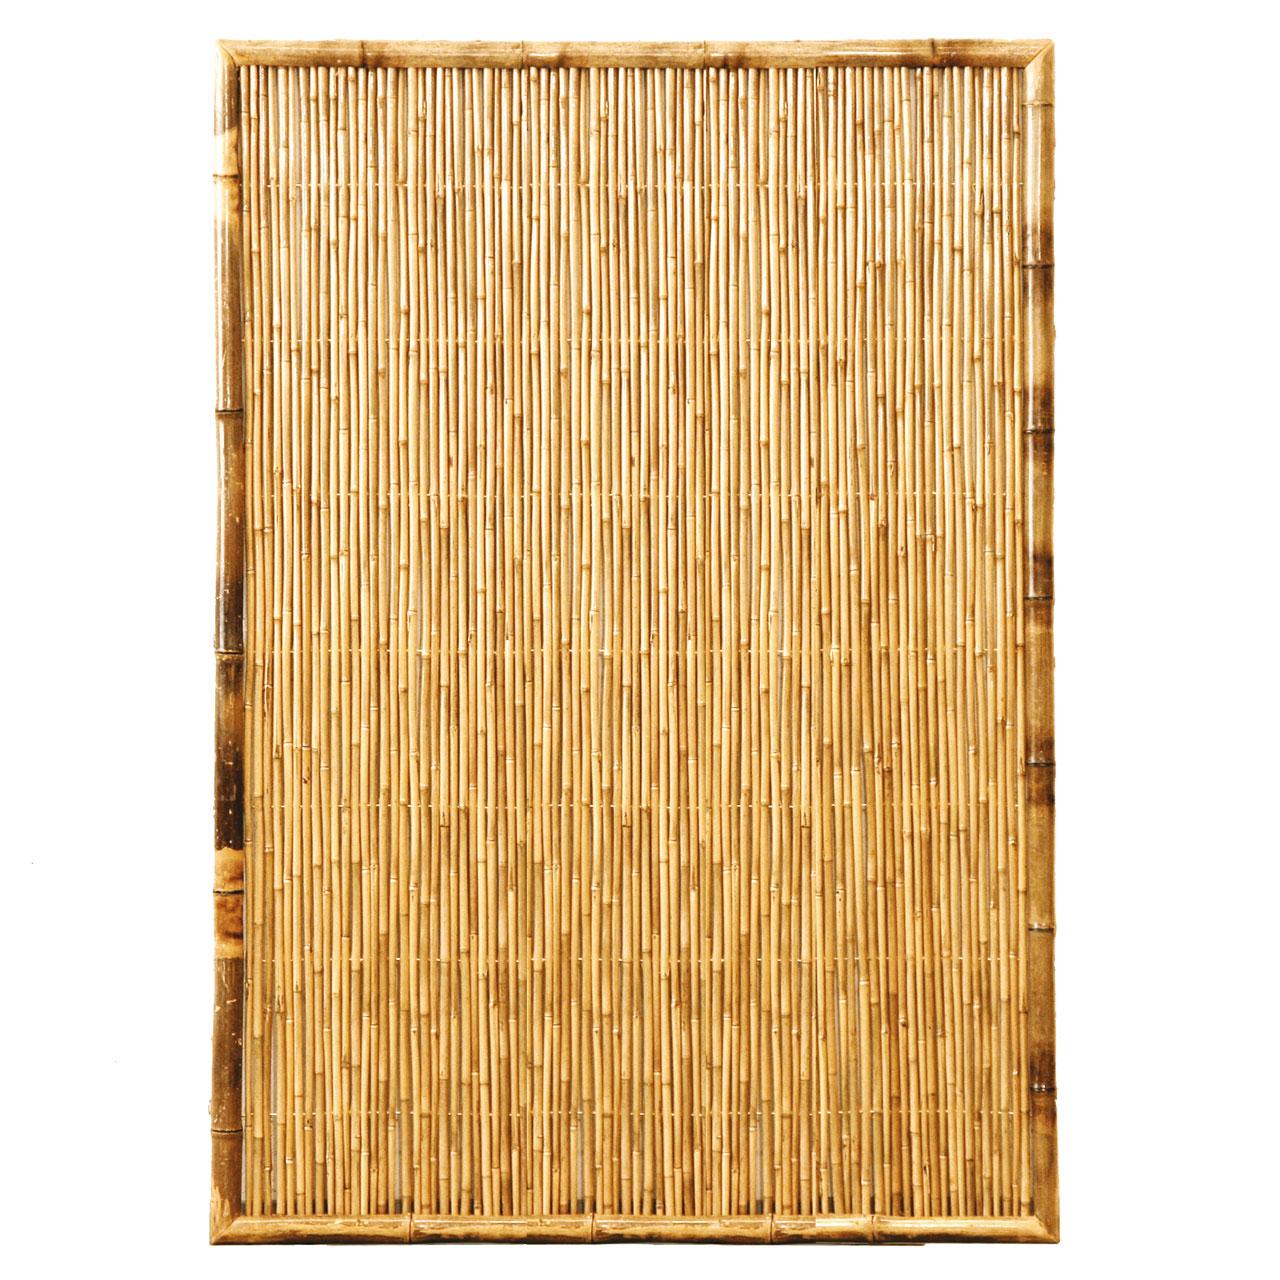 Sichtschutzwand Bambus Sichtschutzelement Zen Geschlossen